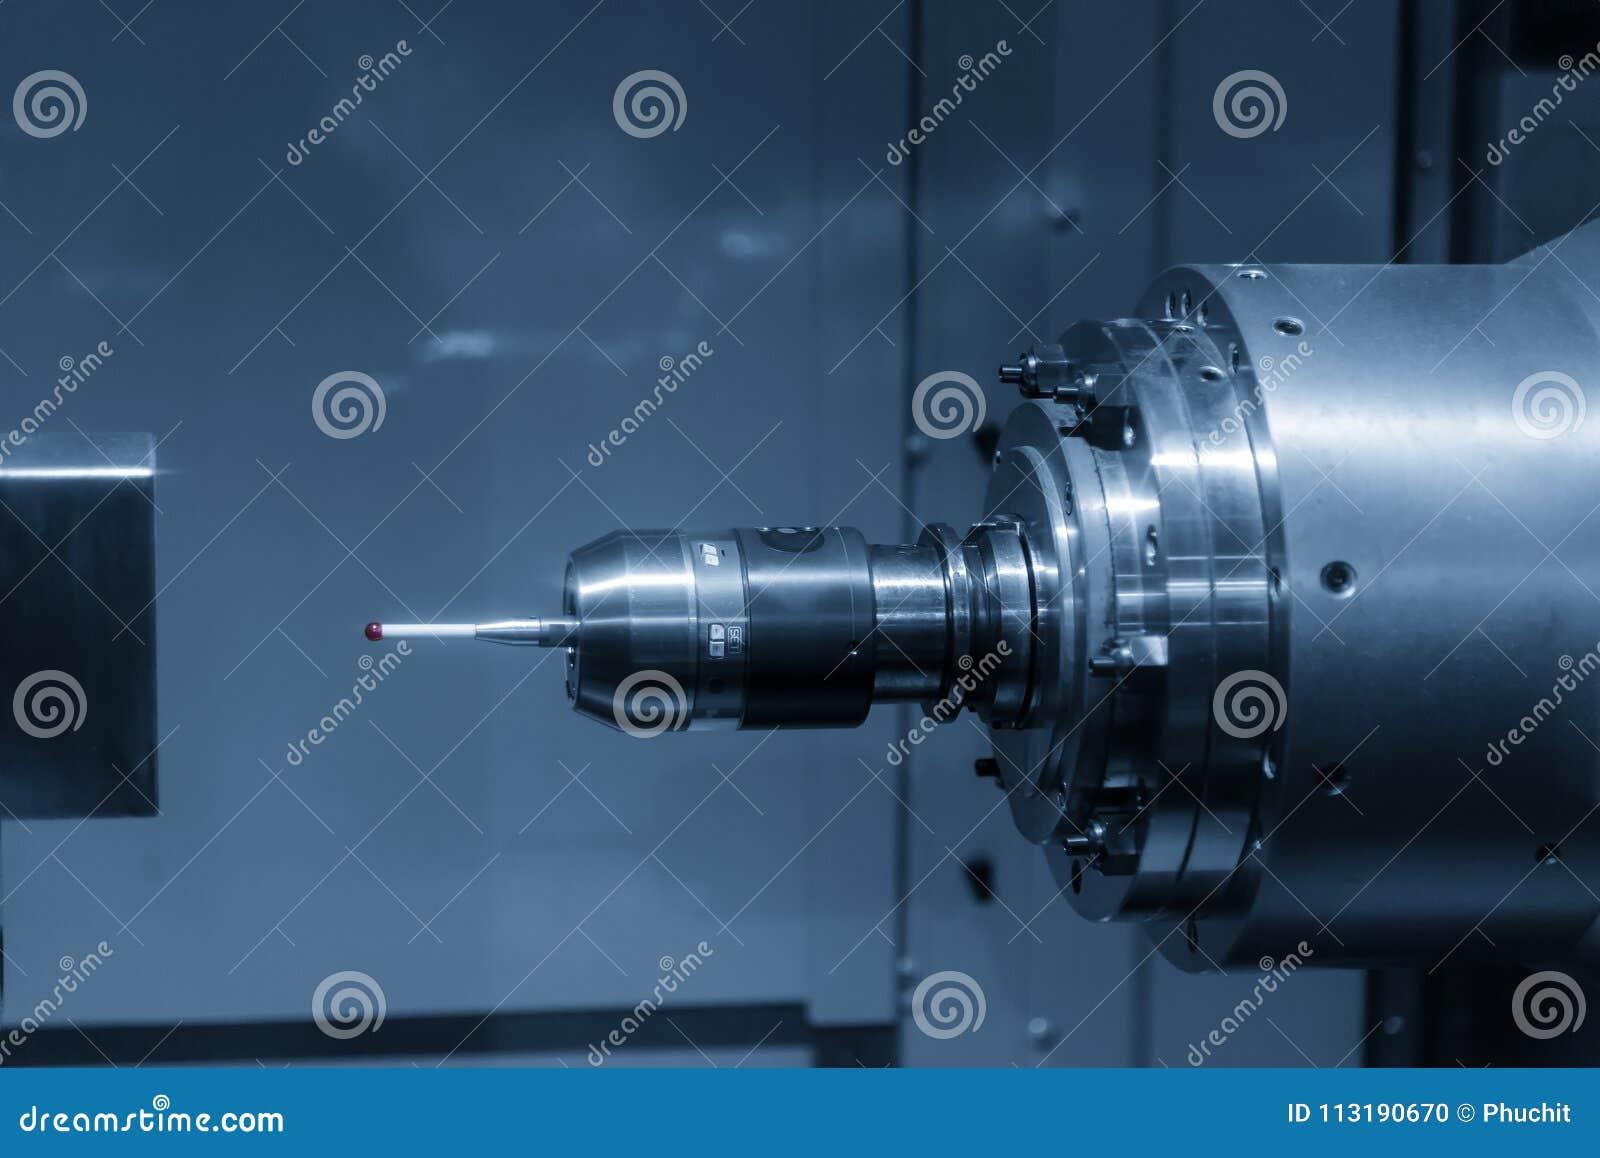 The CMM probe stock photo. Image of horizontal, industrial - 113190670